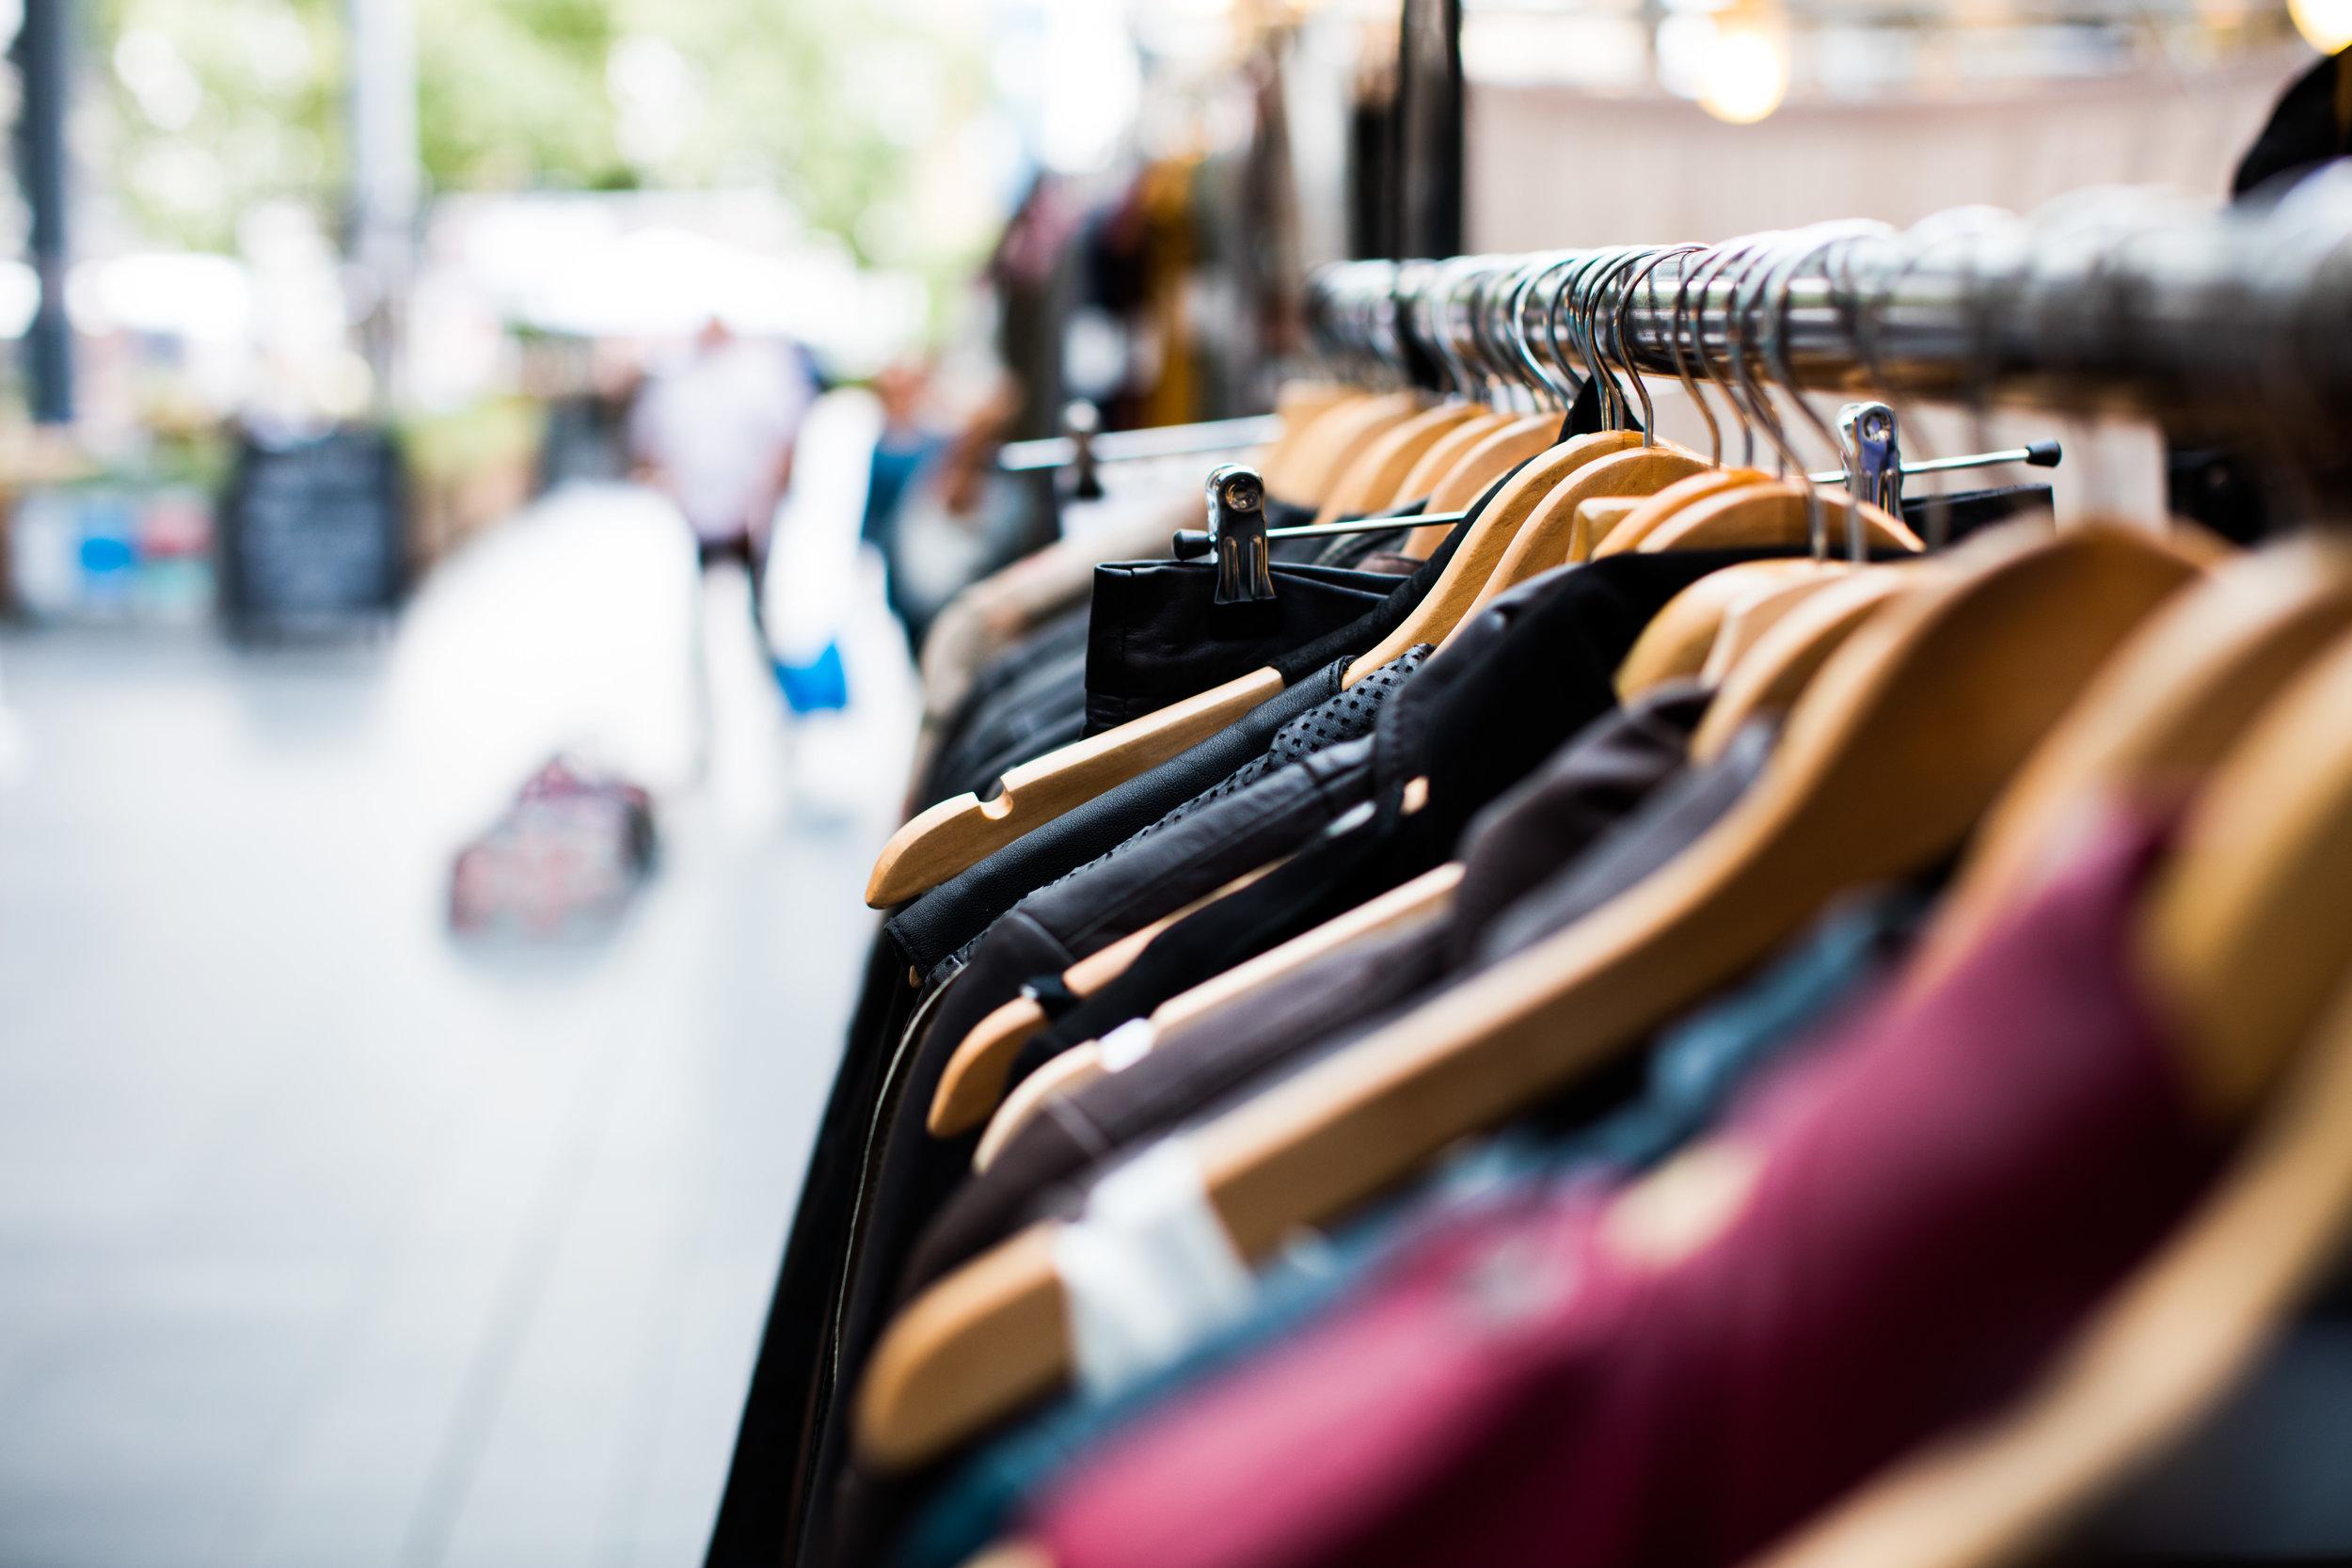 Valhalla Clothing Subscription Tampa